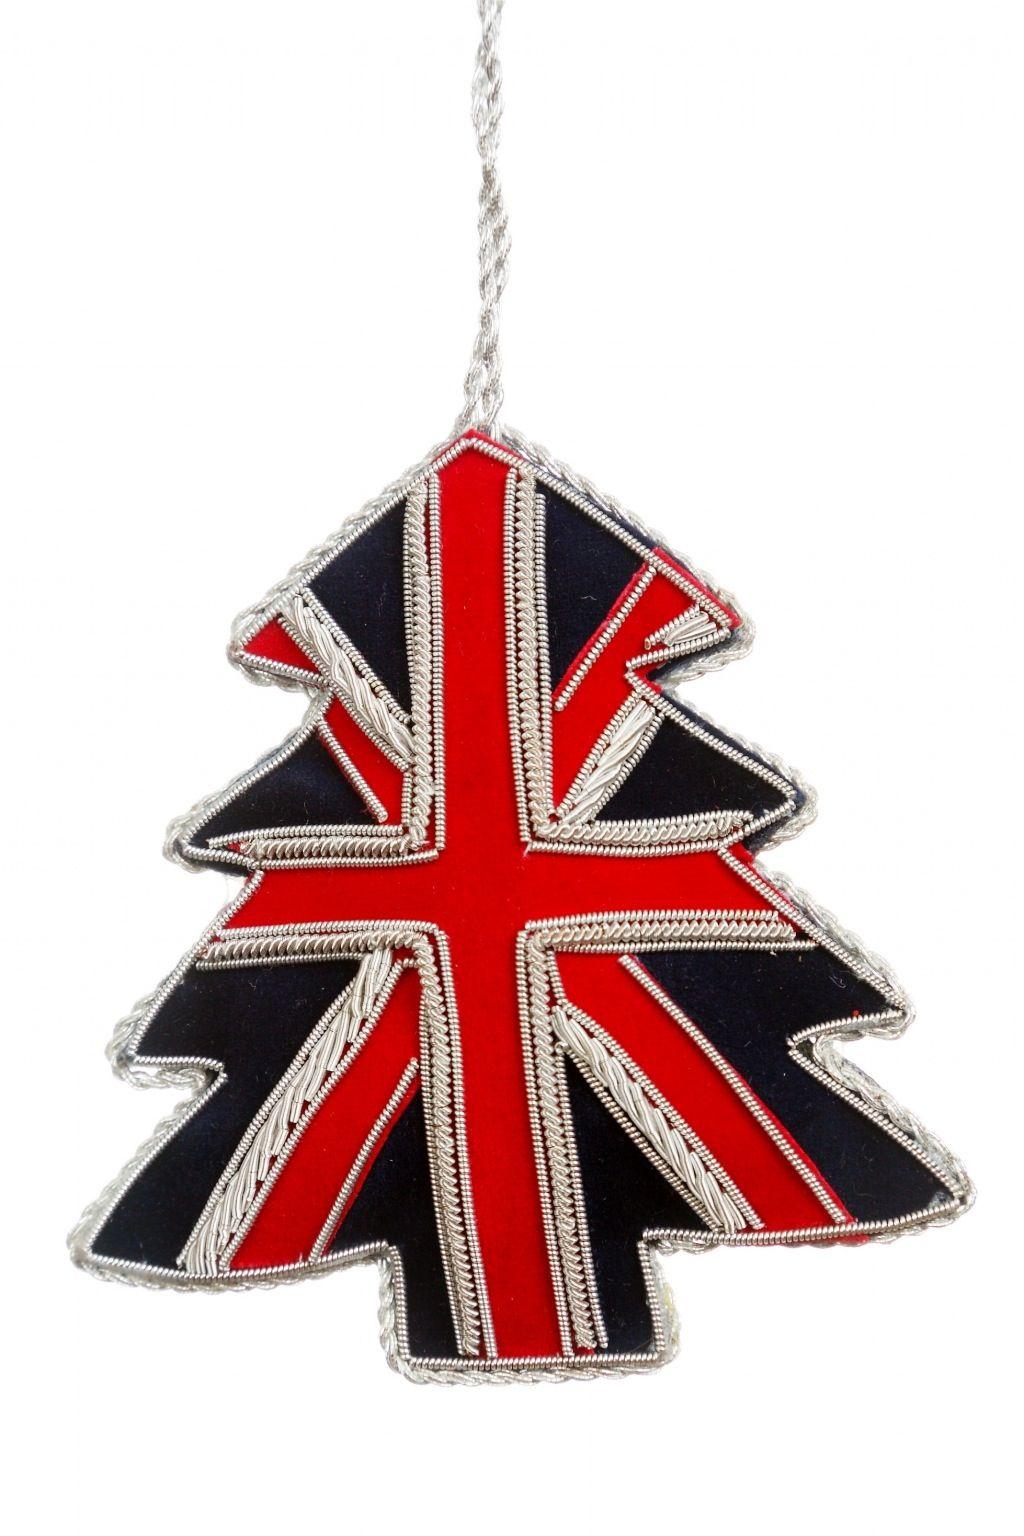 British Christmas tree ornament (2020)